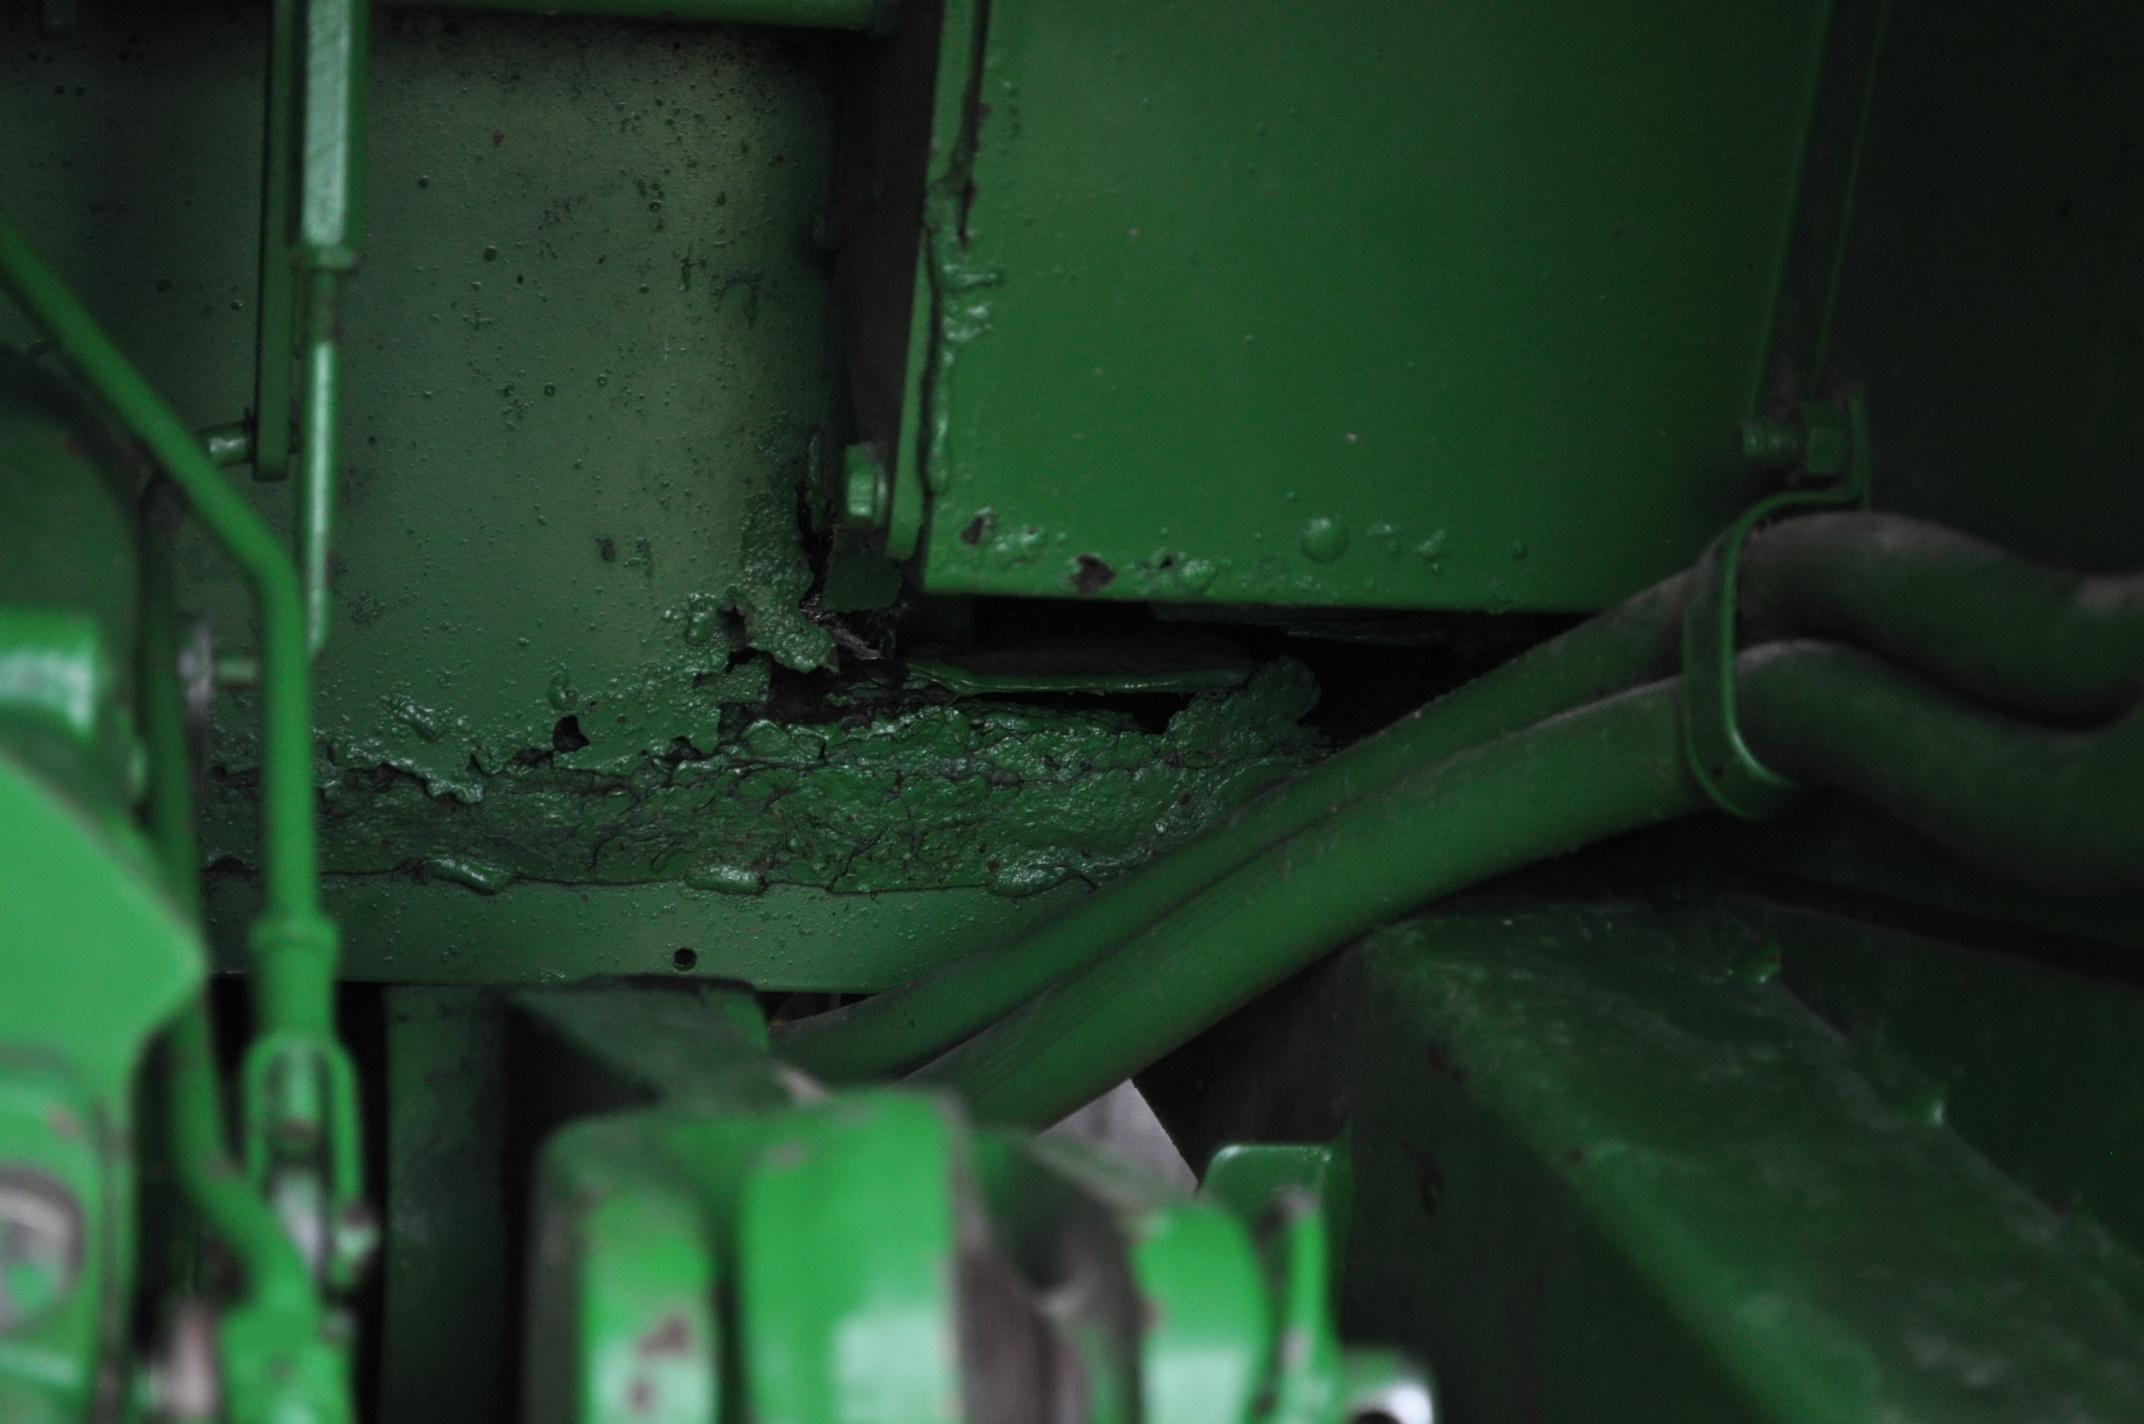 John Deere 4230 tractor, diesel, 18.4-34 hub duals, 10.00-16 front, CHA, Quad range, 2 hyd - Image 17 of 23